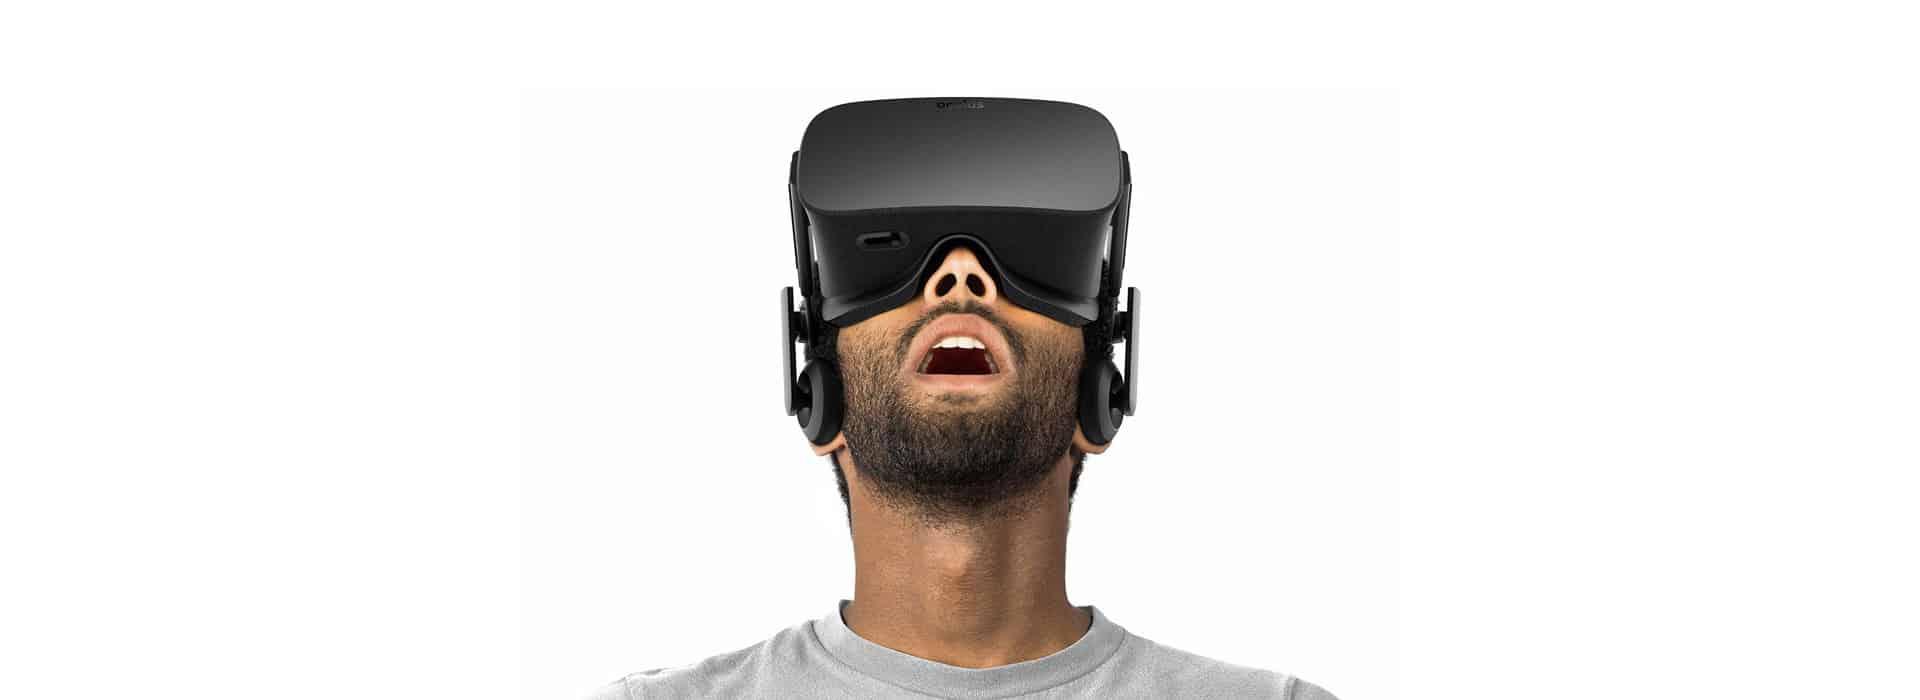 Virtual Reality gets real